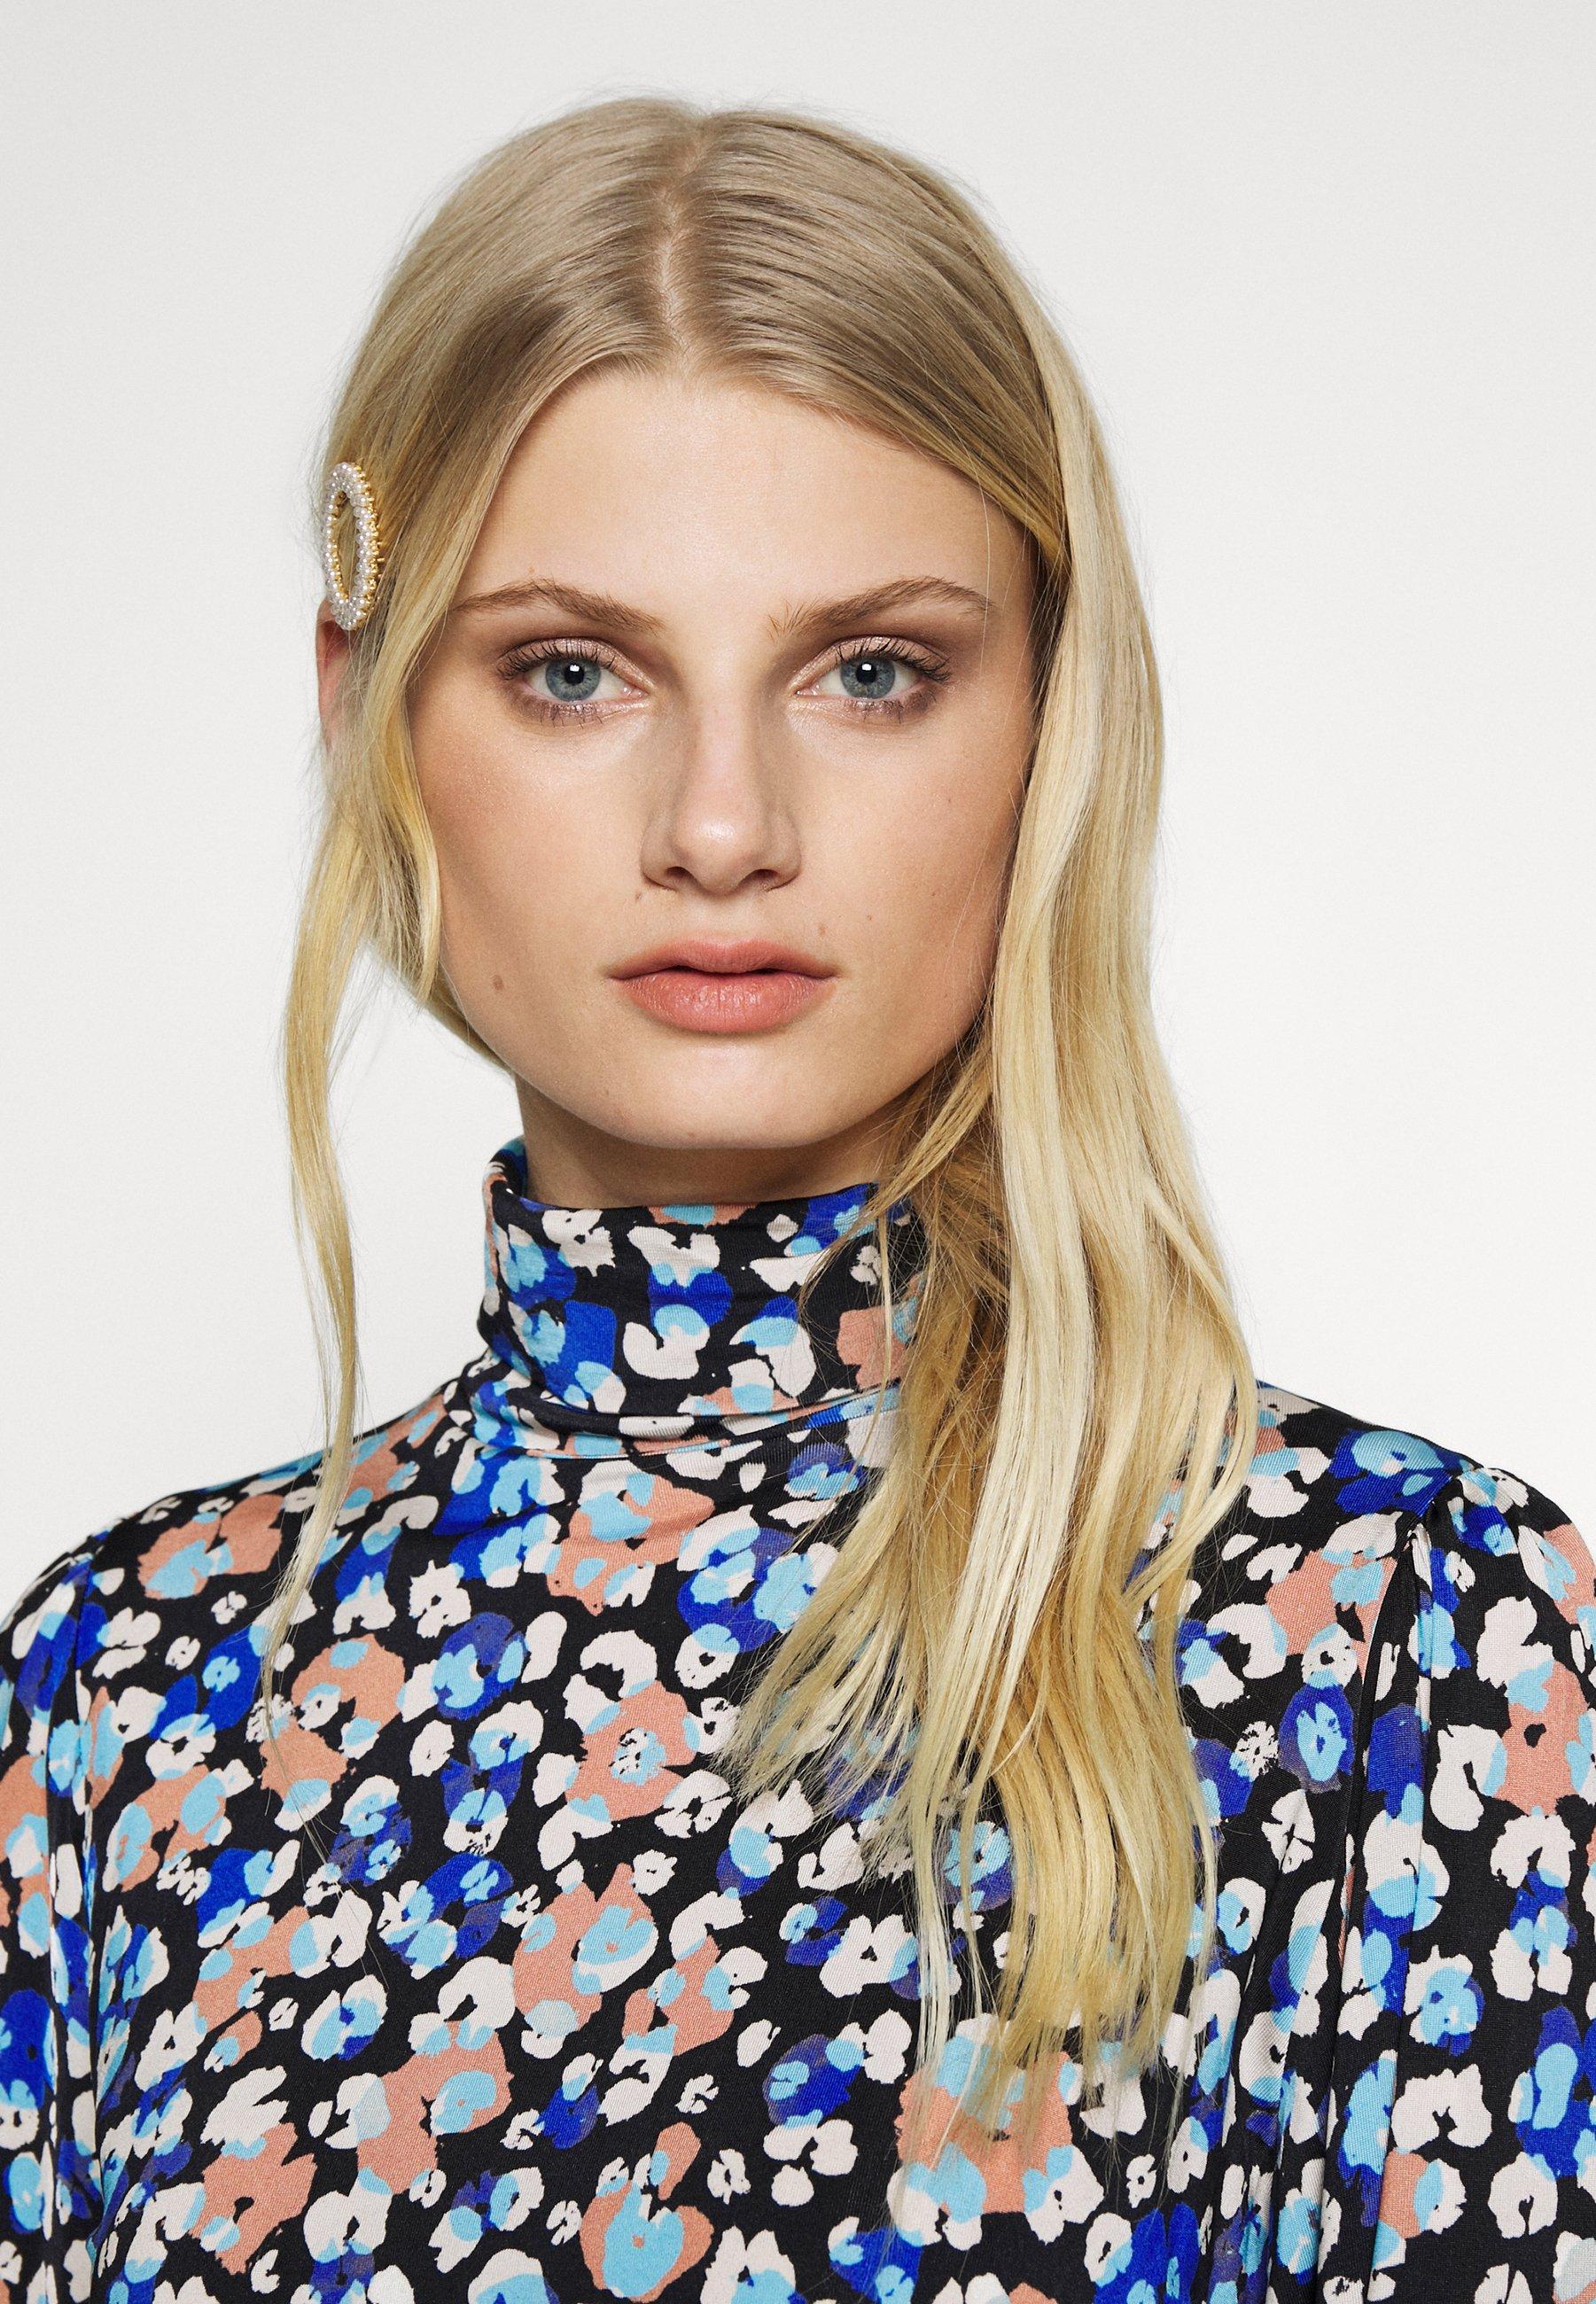 Fabienne Chapot Billy Turtleneck - Långärmad Tröja Leopard Blossom